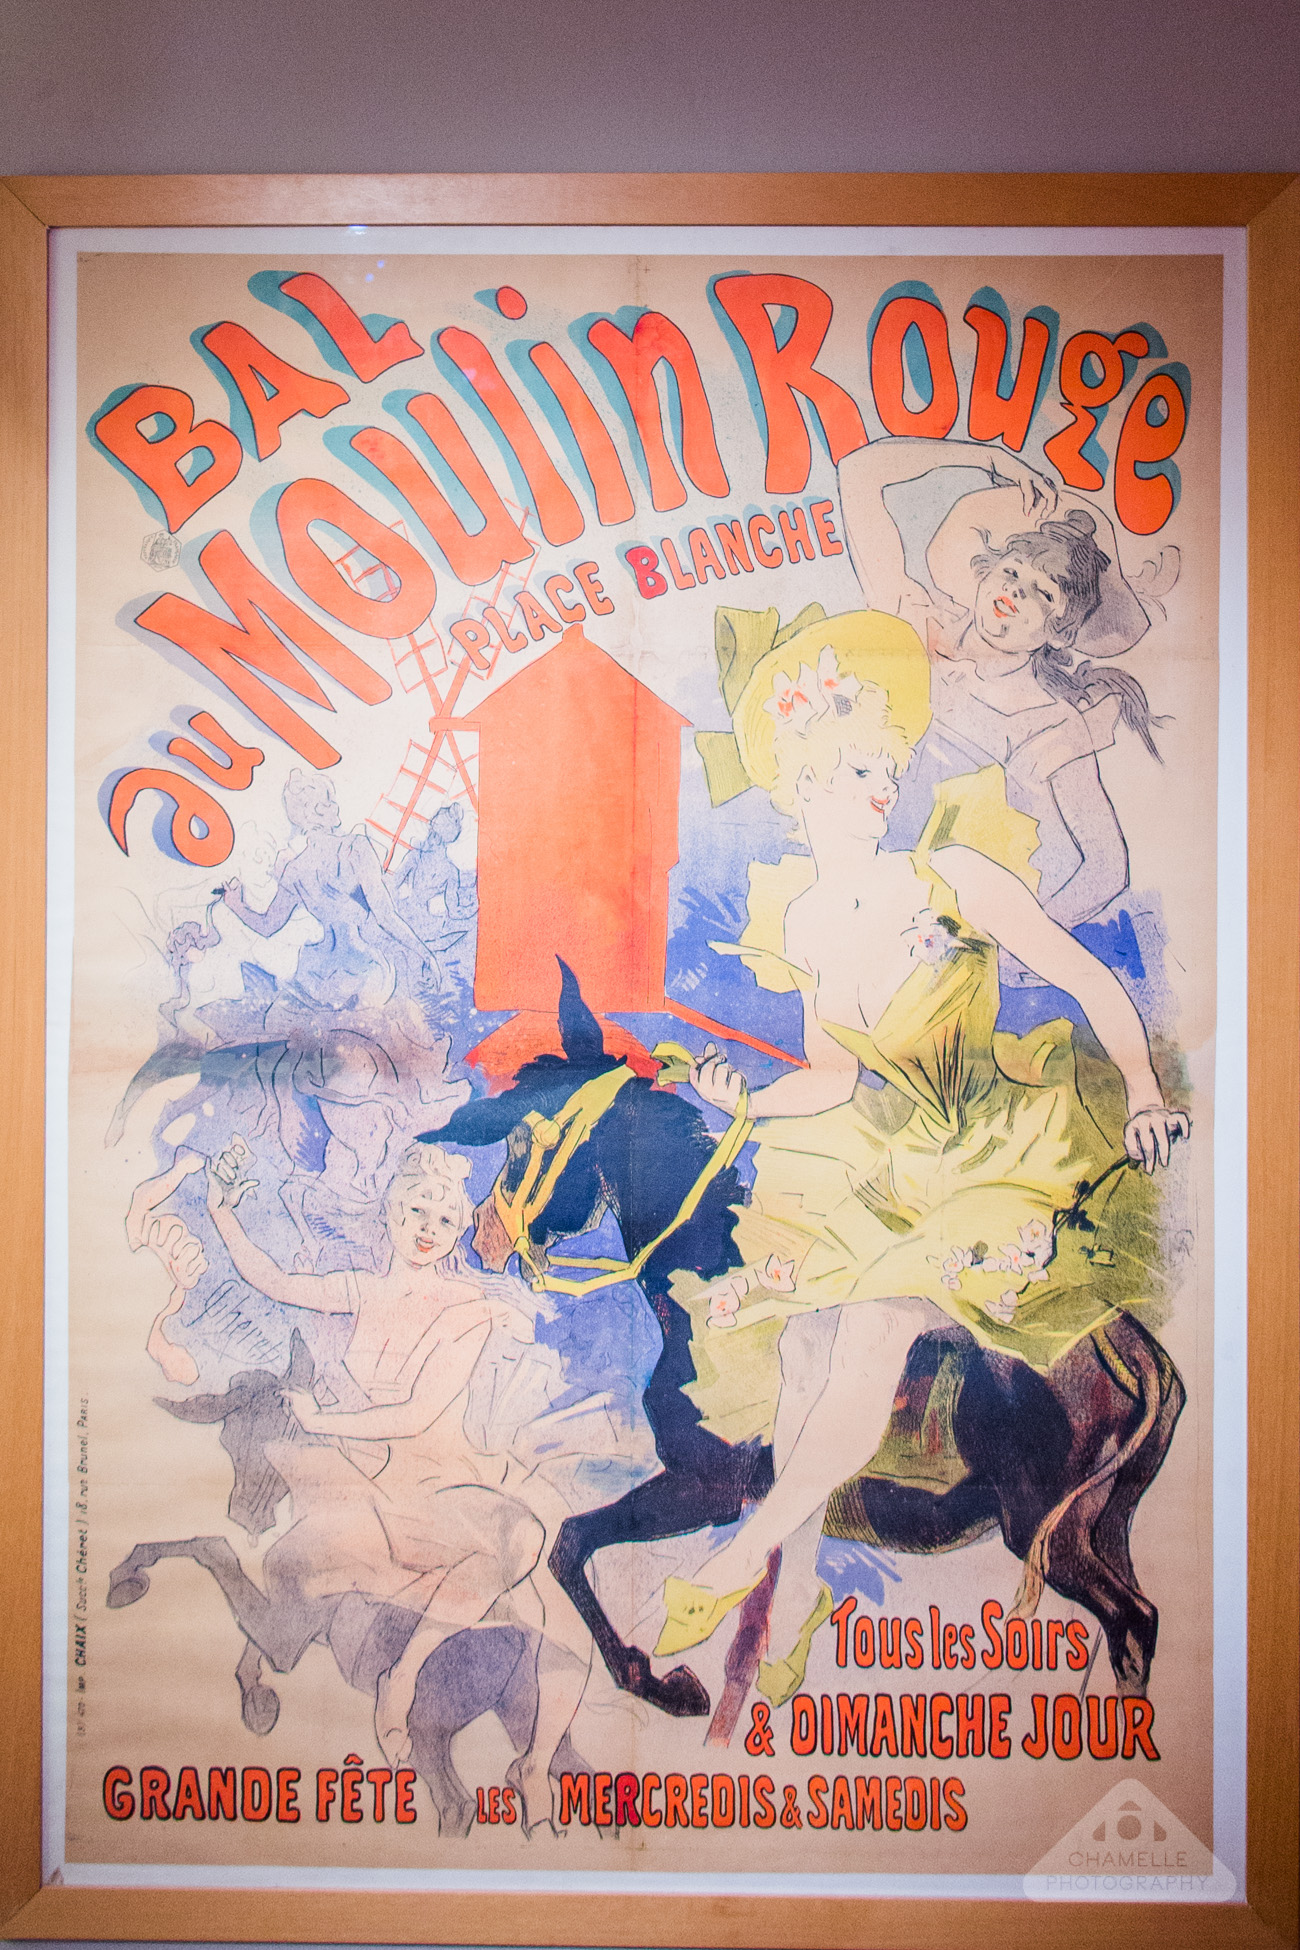 Musee Montmartre Museum Paris France travel blog photography Moulin Rouge